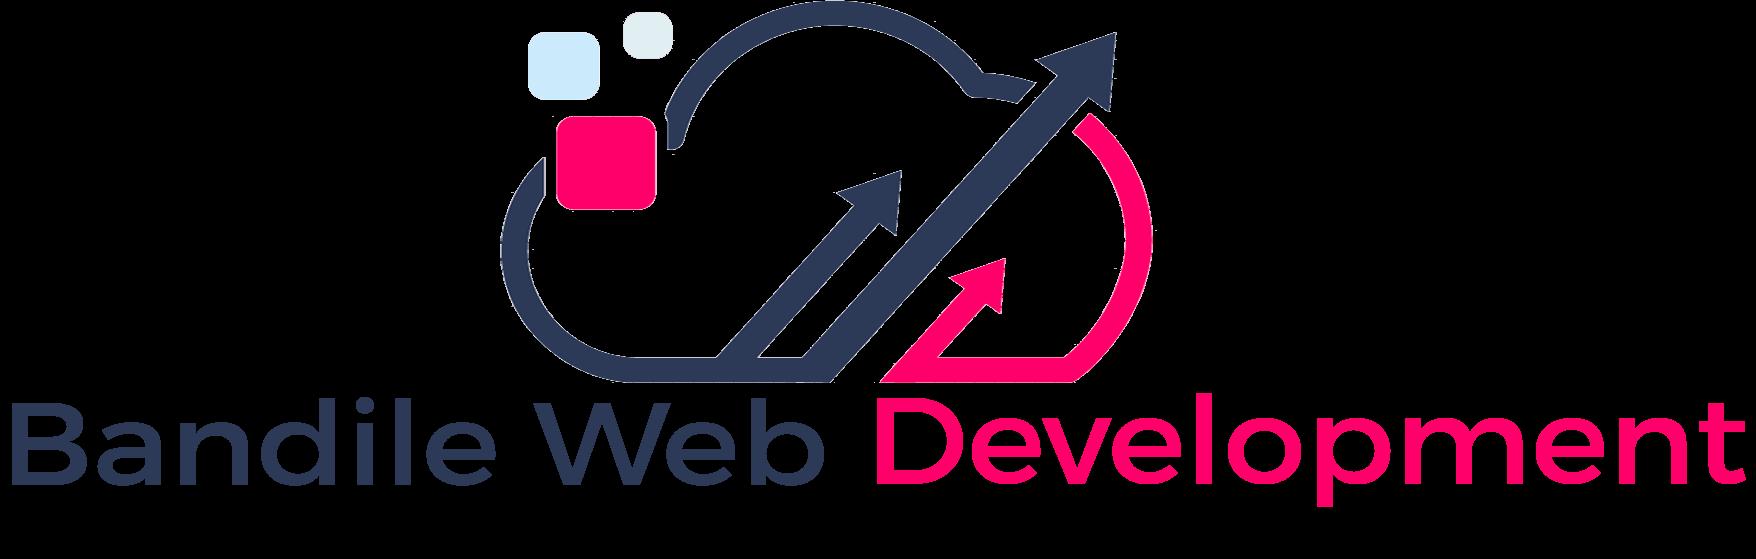 Bandile Web Development